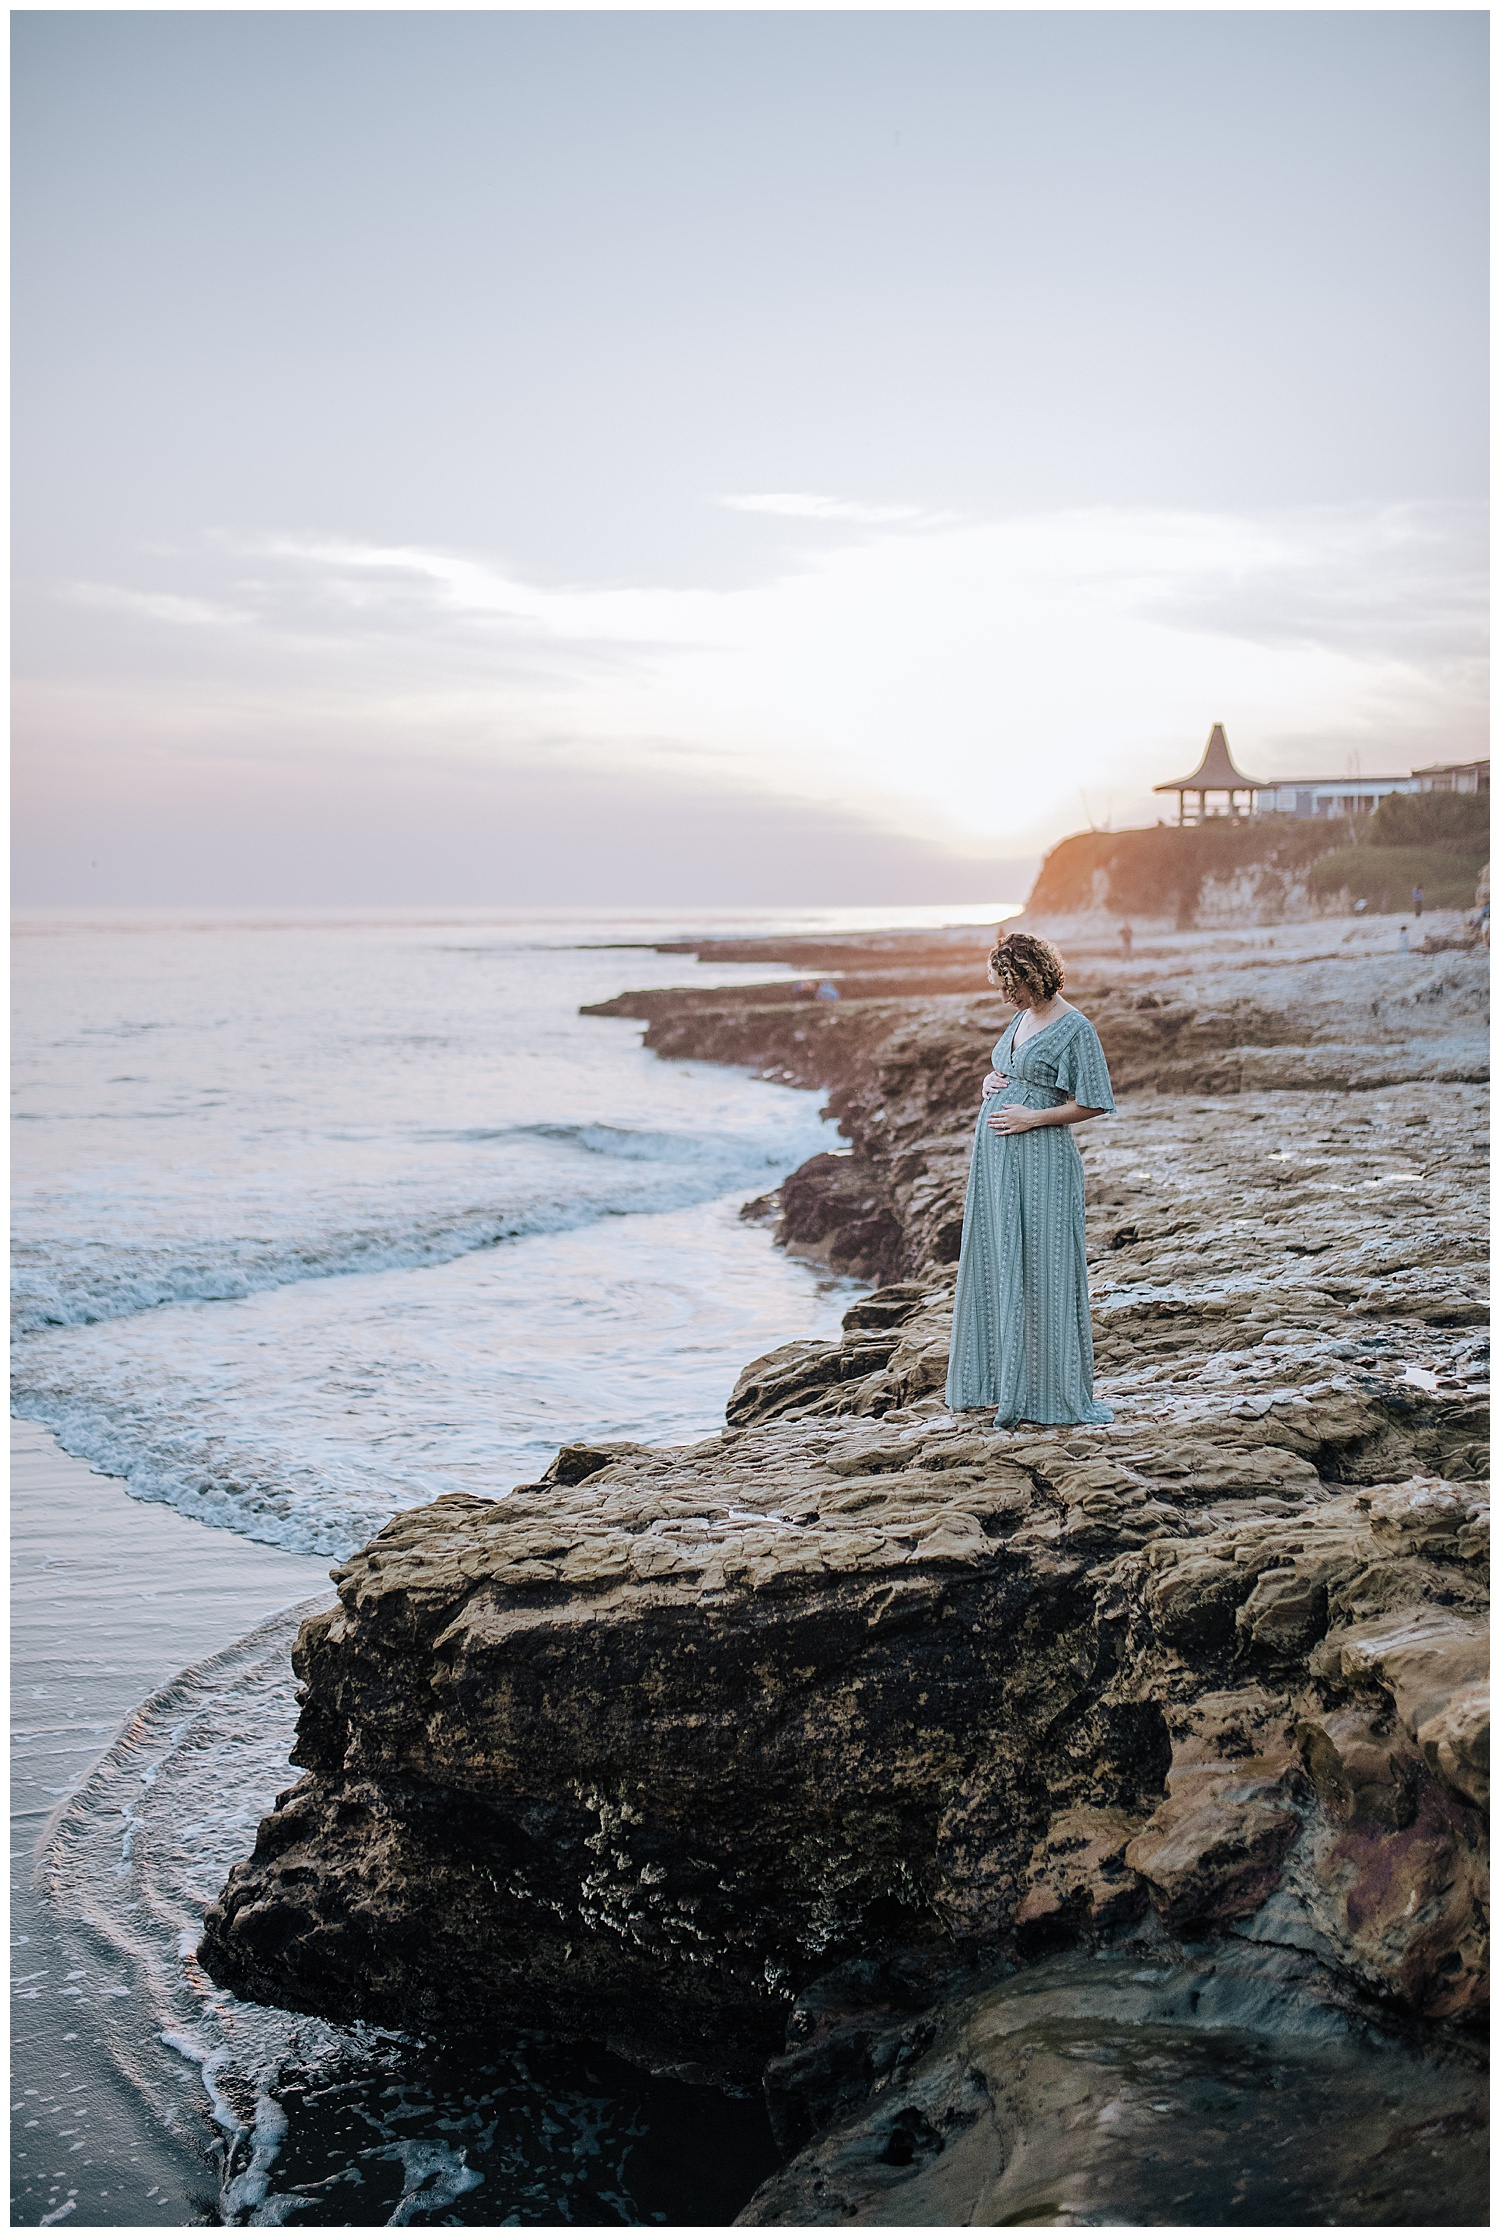 beach maternity session at sunset overlooking ocean in santa cruz